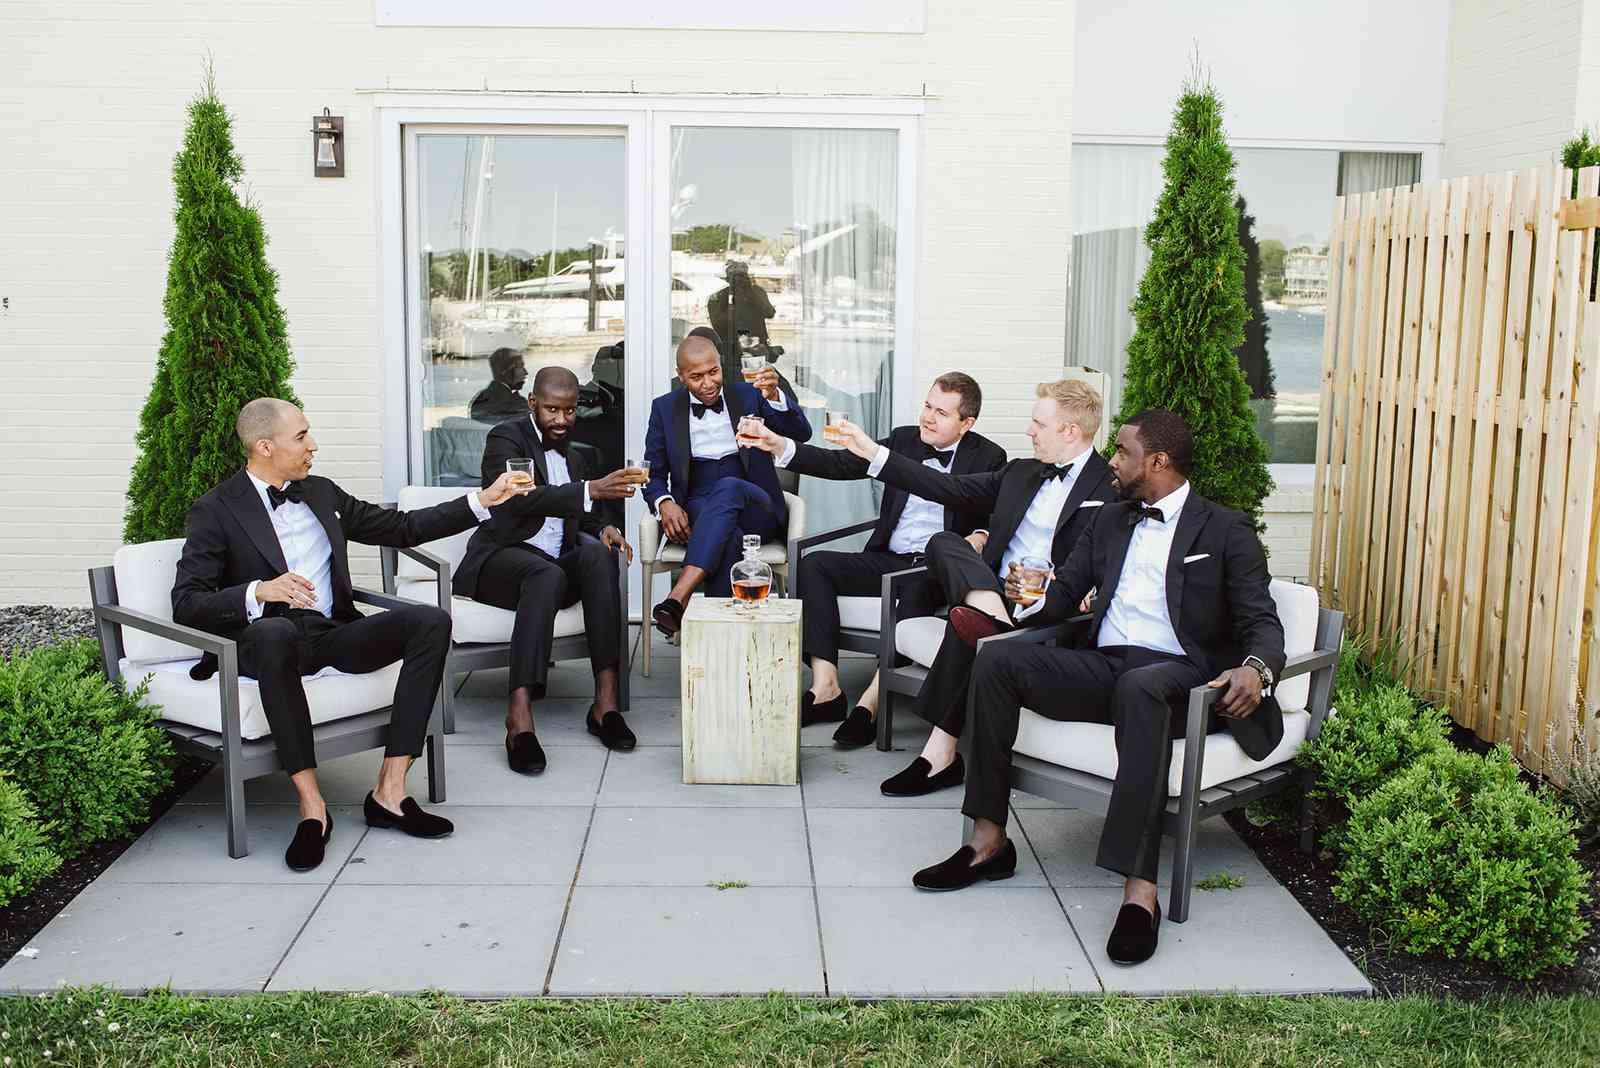 Groomsmen drinking together